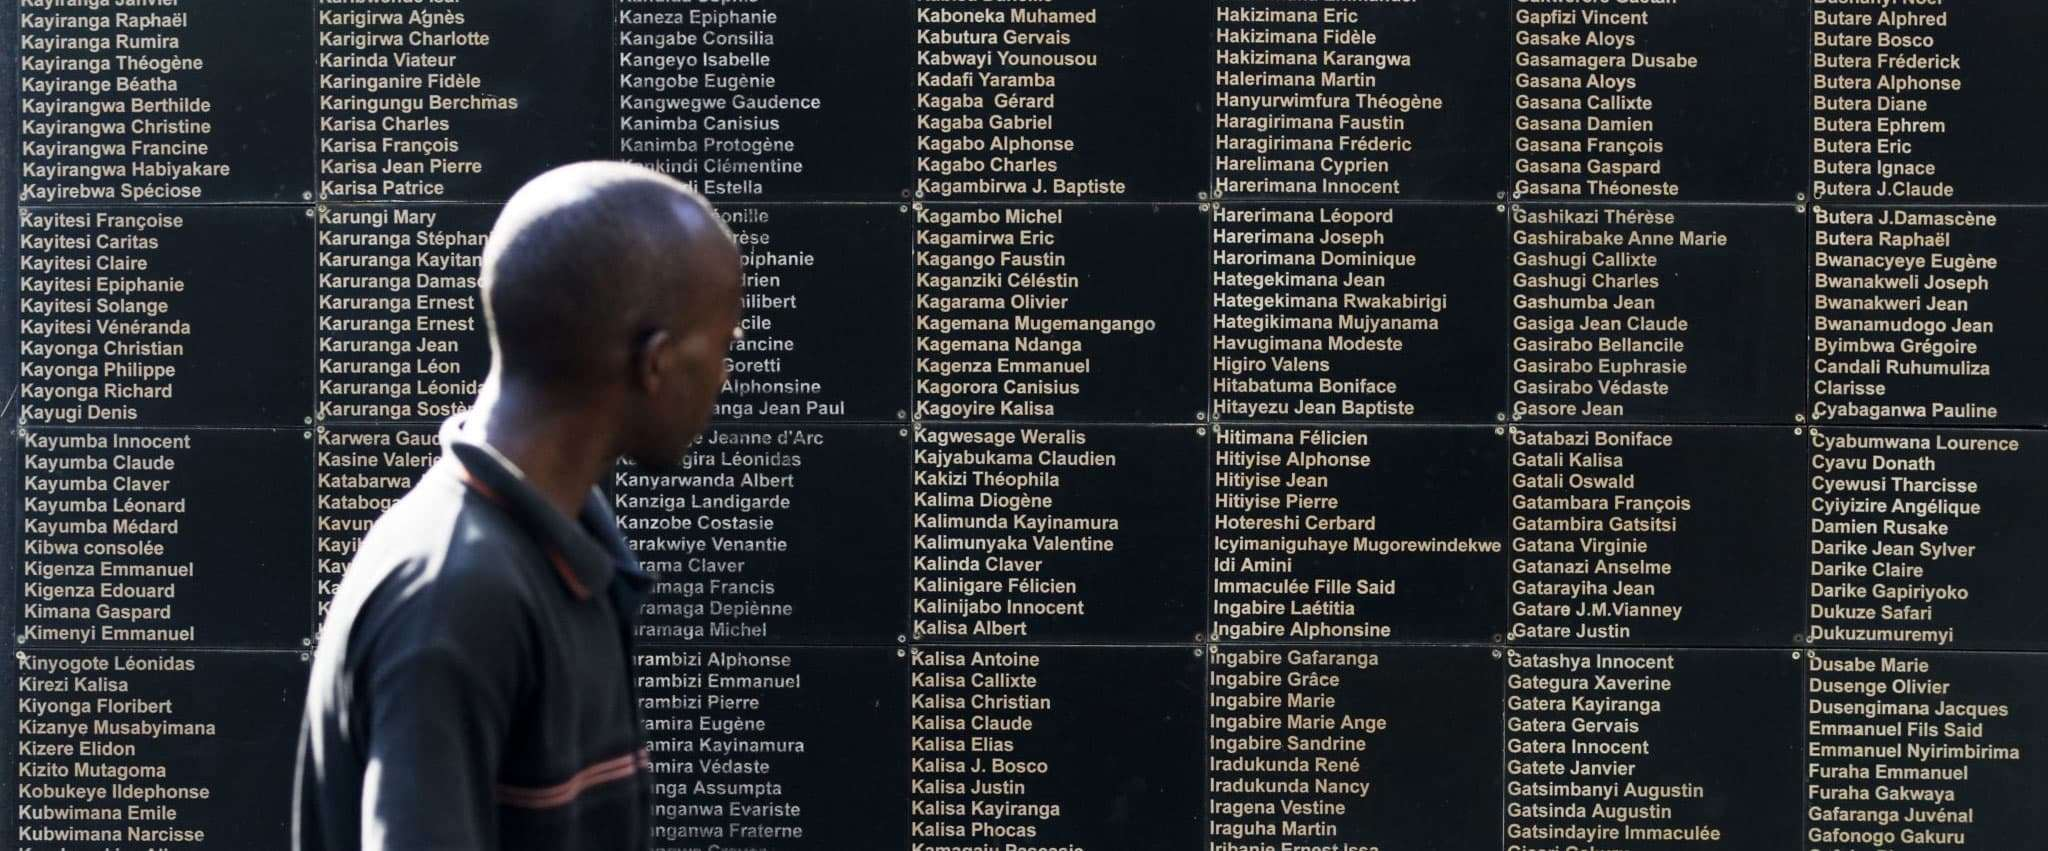 Victims of the 1994 genocide - Rwanda